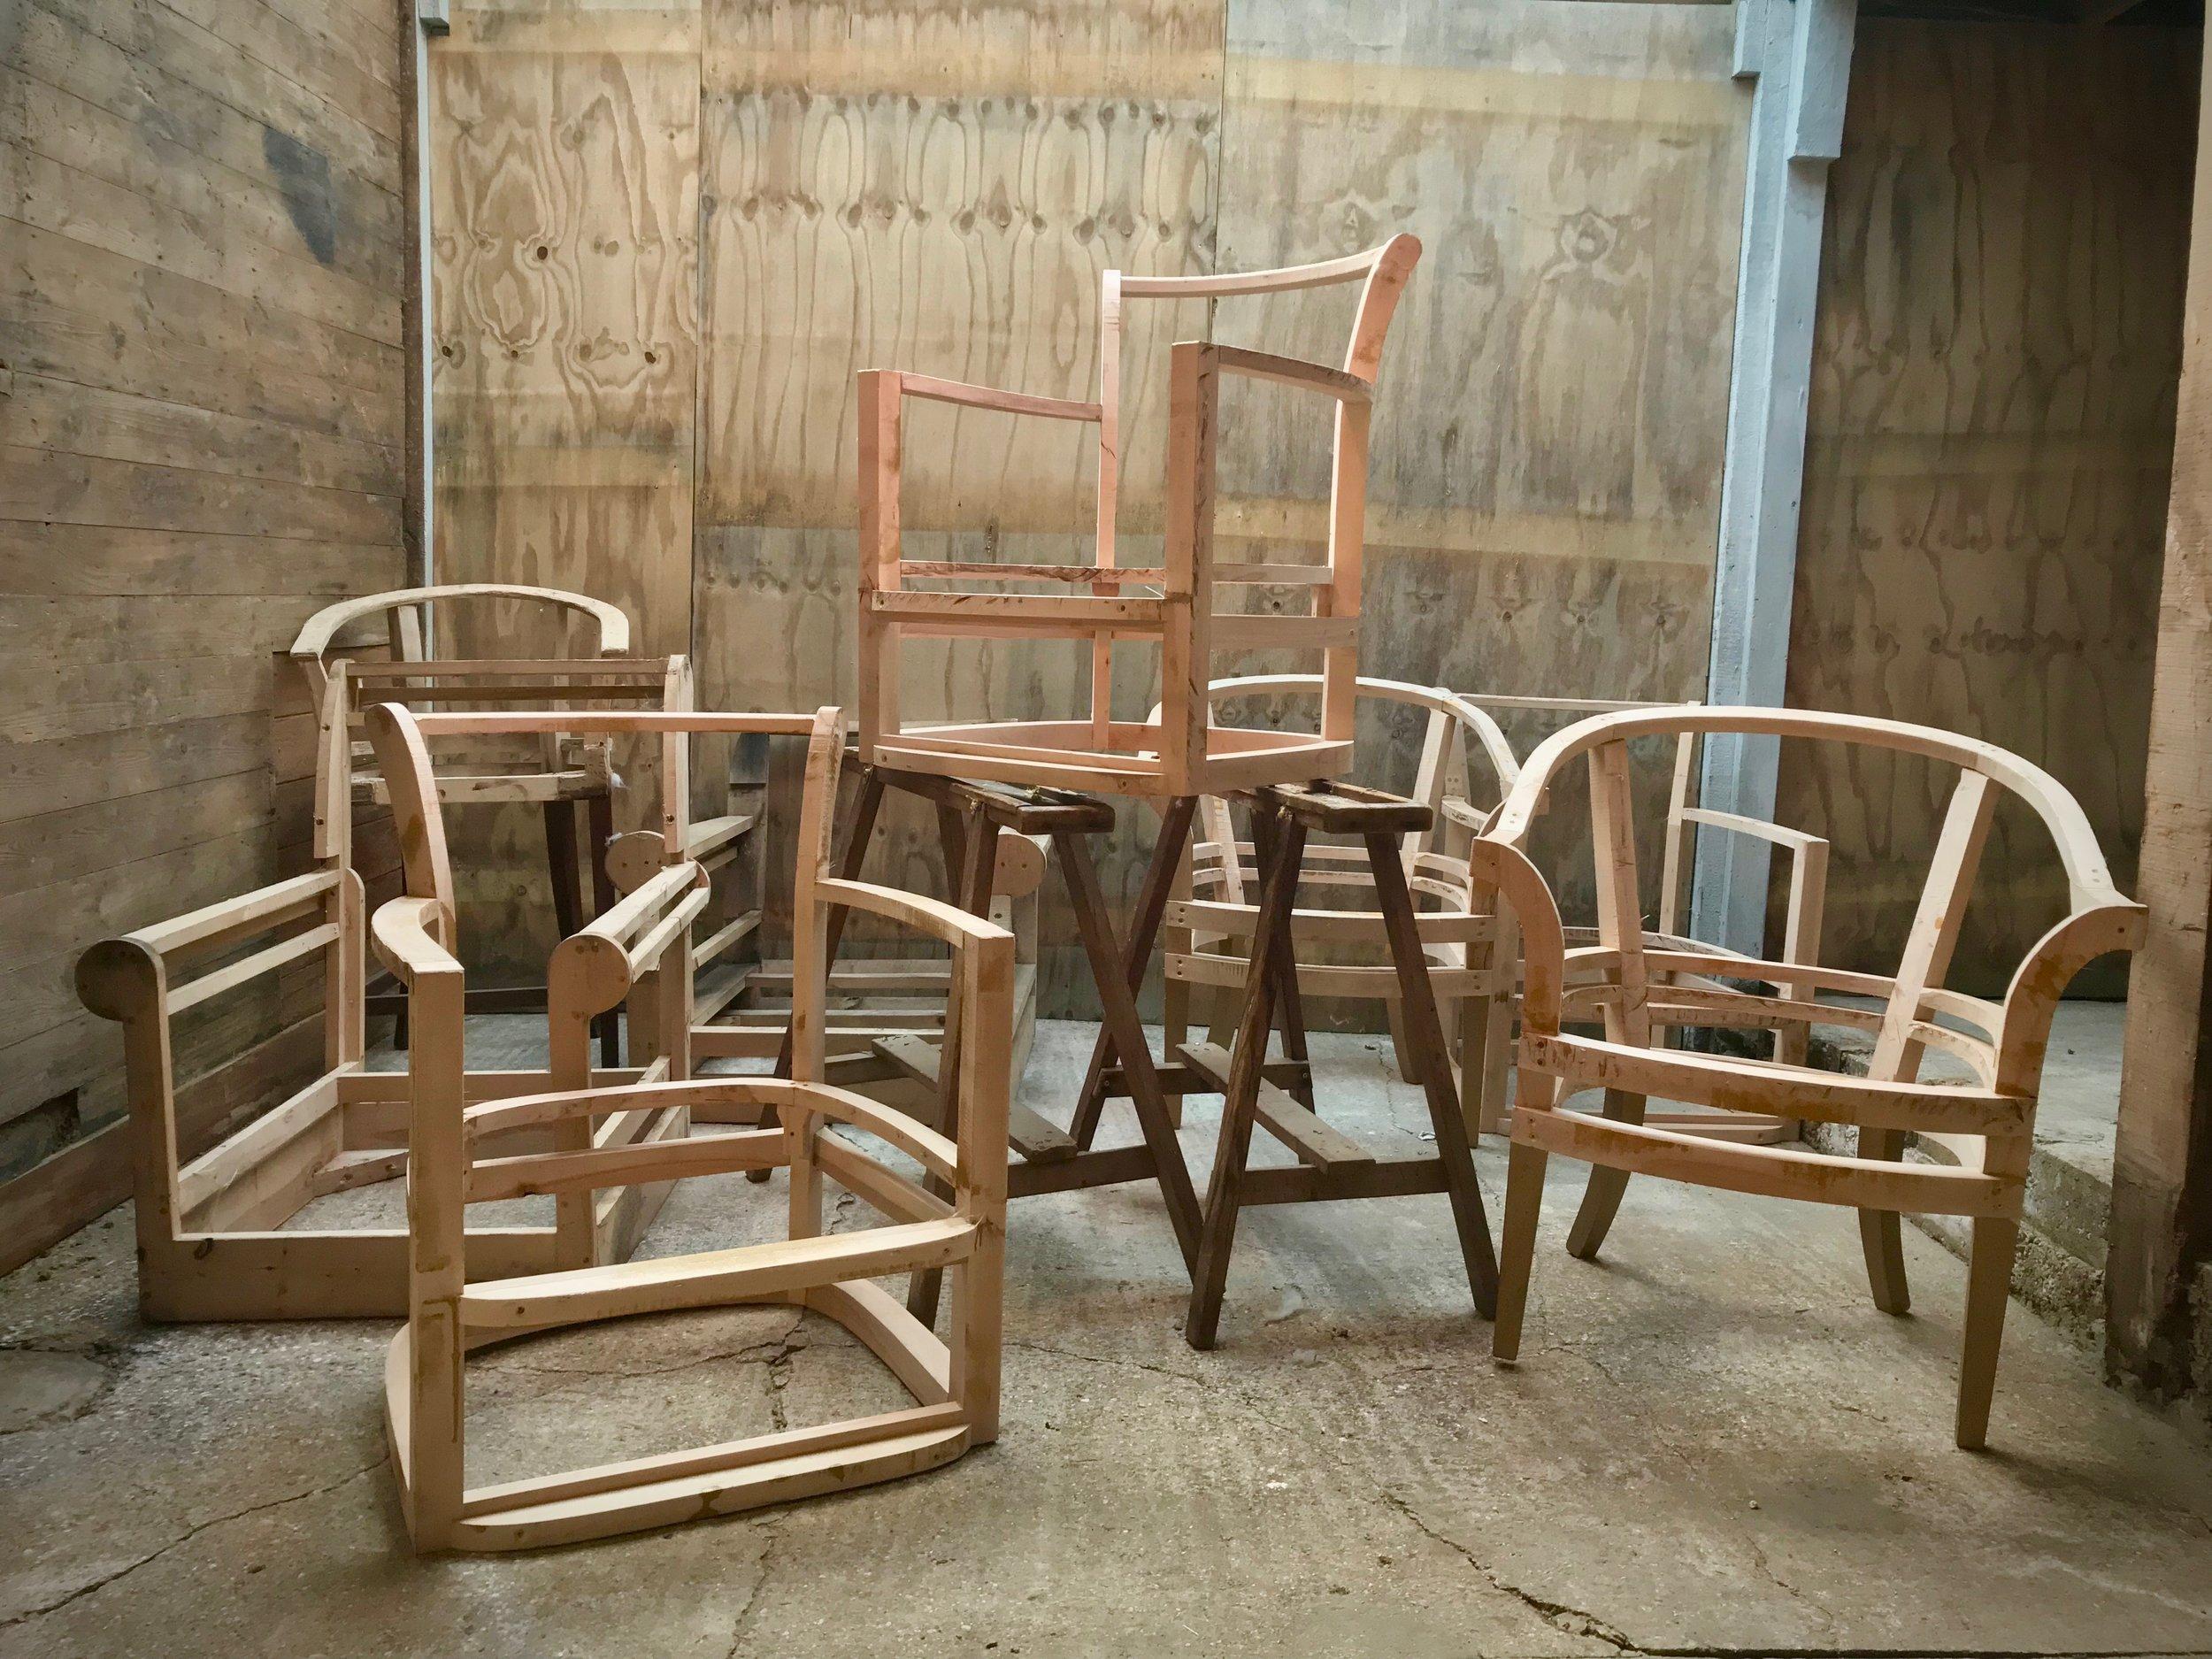 Phoenix Upholstery, Bedford, Bespoke Furniture, - Example 2 (Beech Furniture Frames)